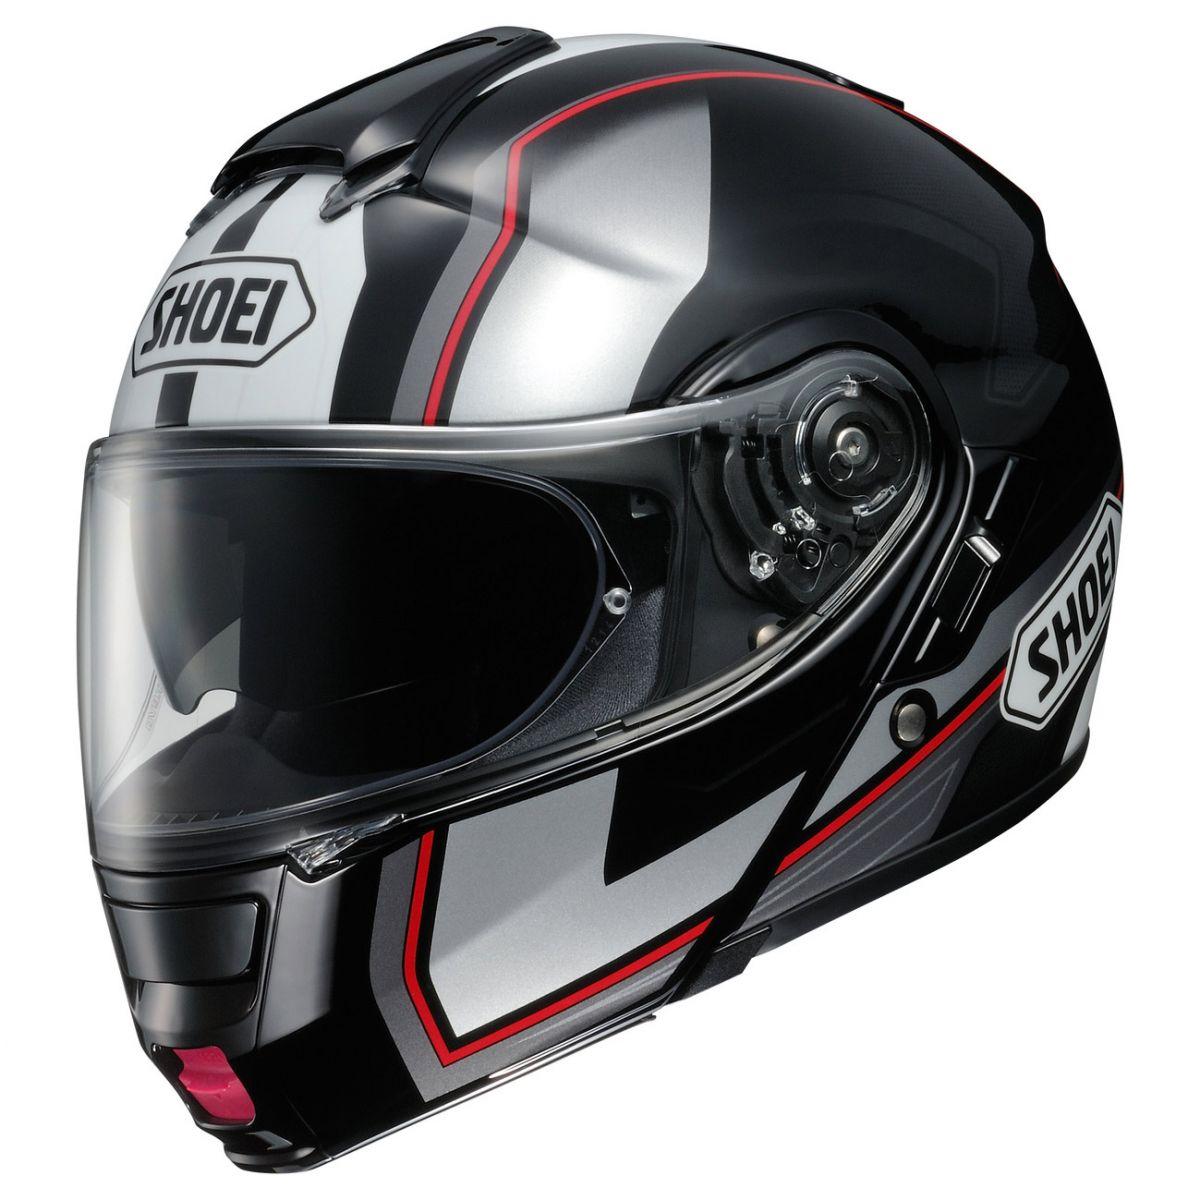 Capacete Shoei Neotec Imminent TC-5 Escamoteável  - Nova Centro Boutique Roupas para Motociclistas